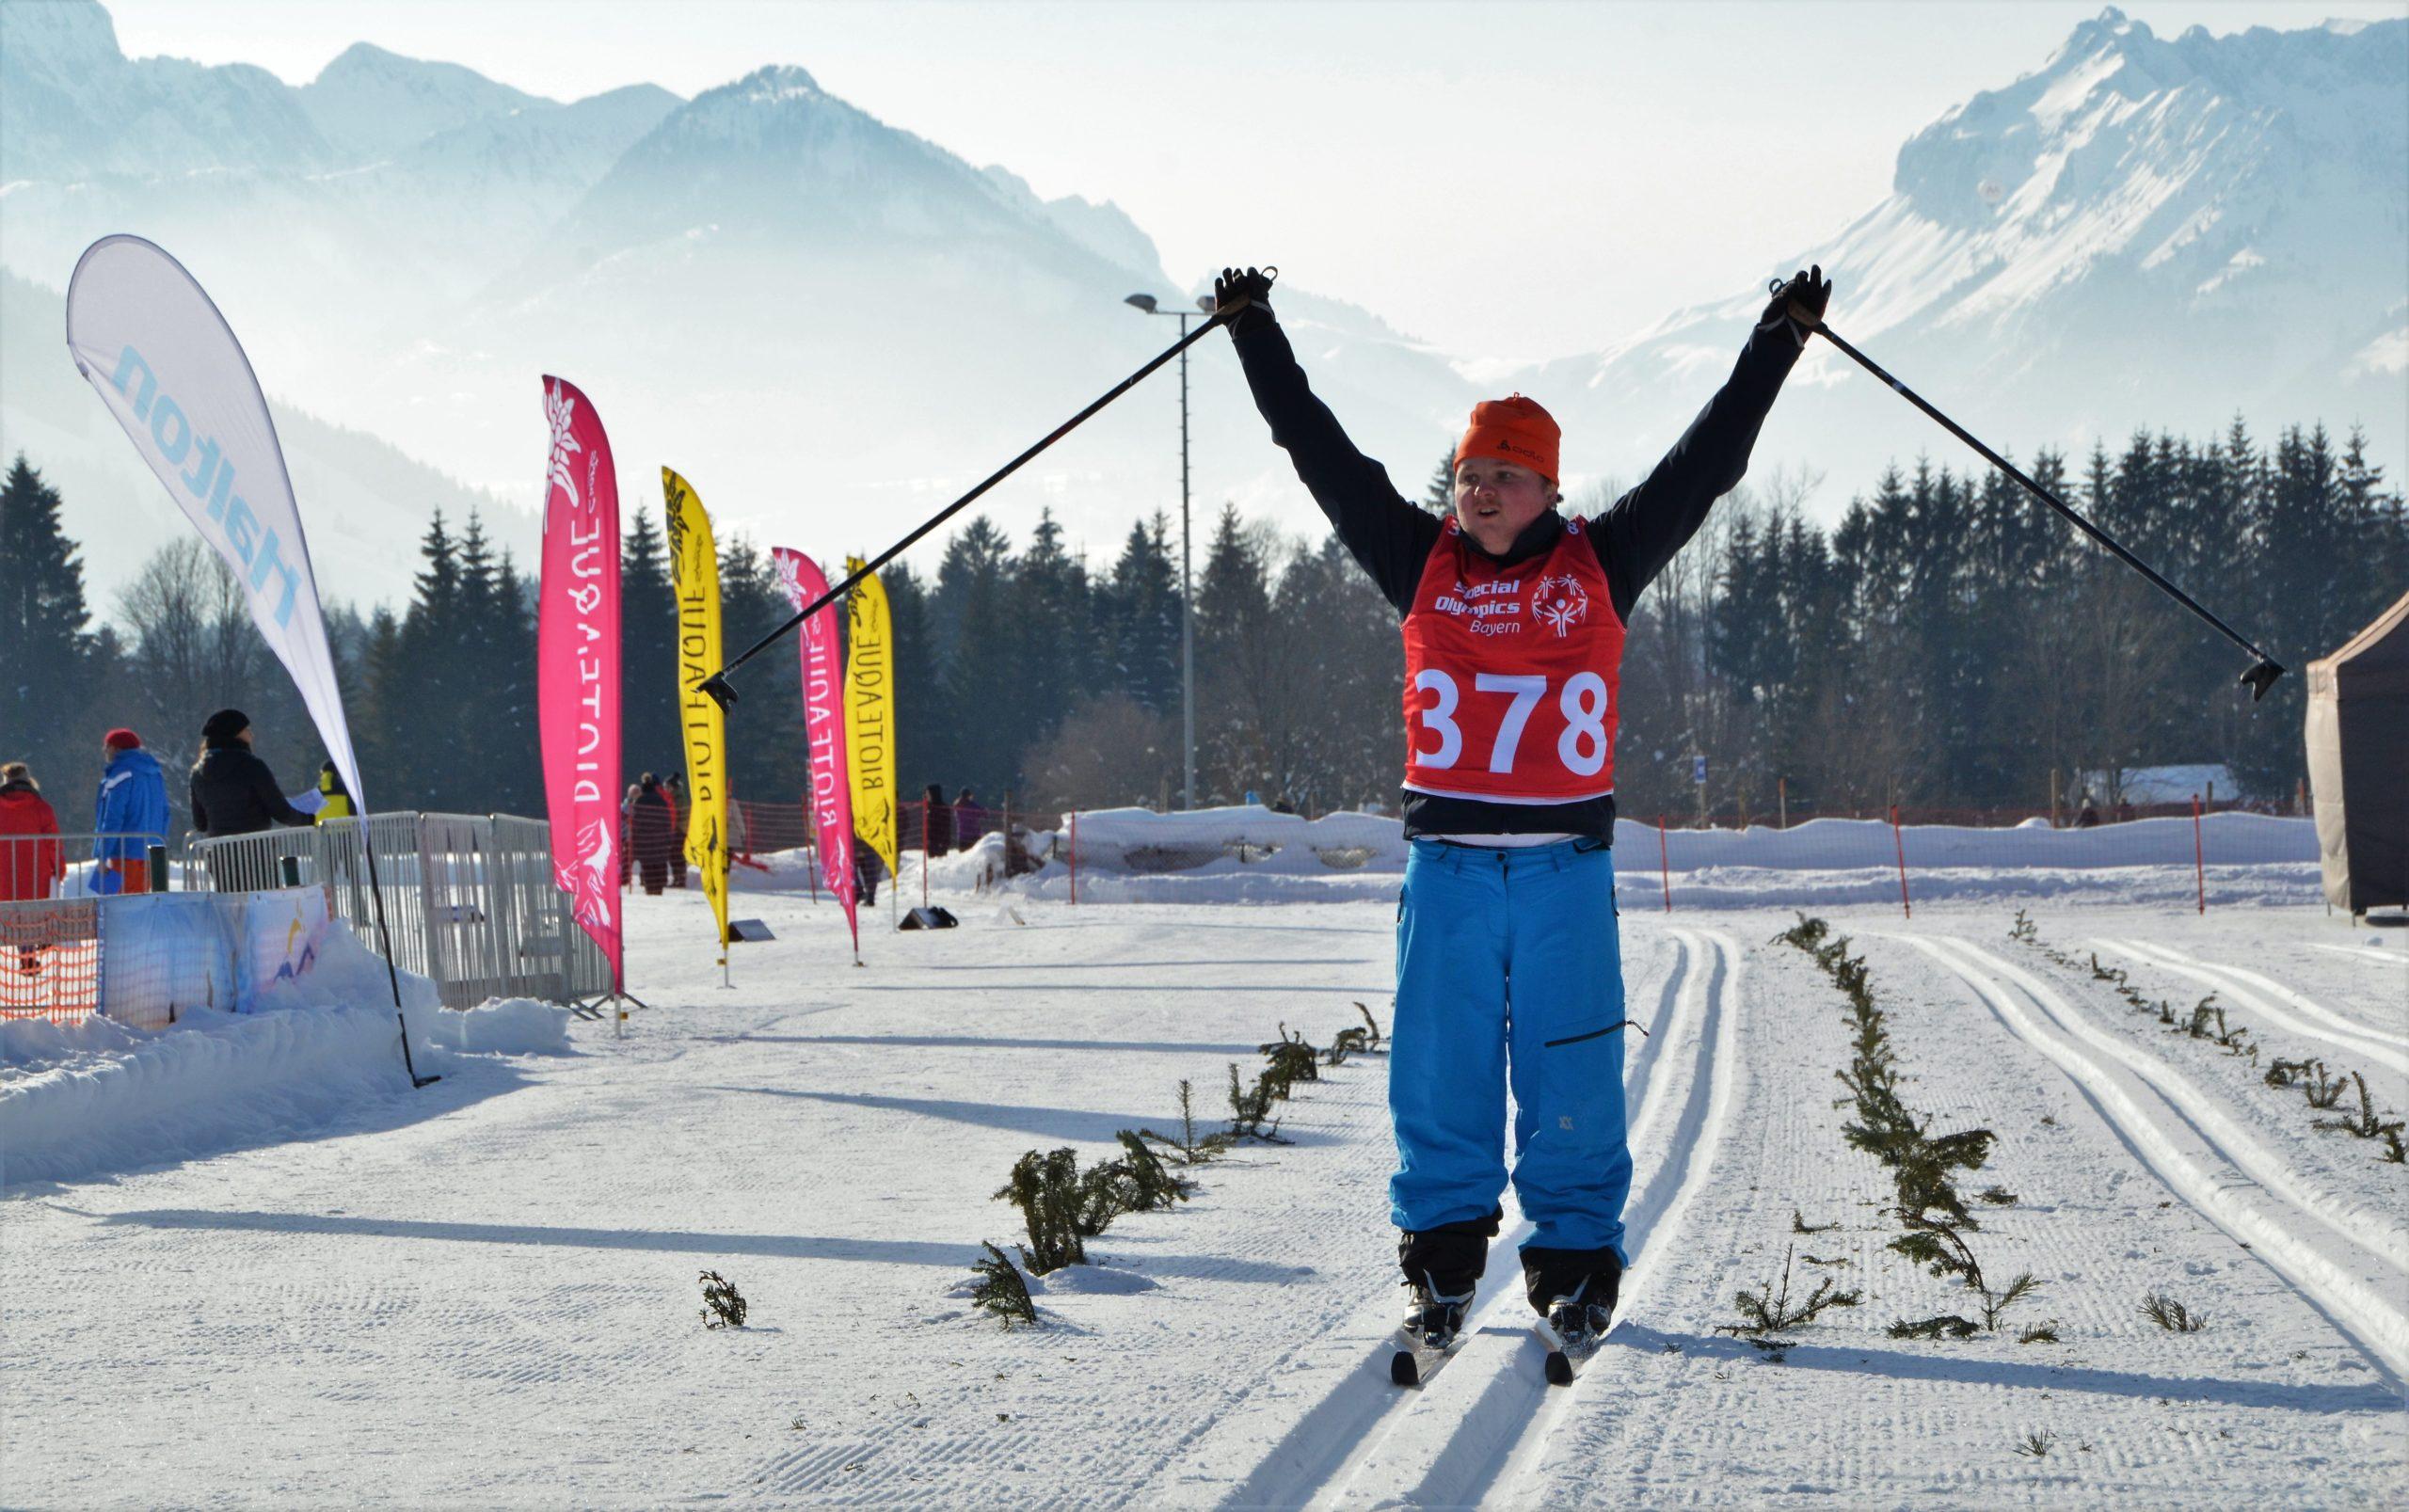 RiW2019_Ski-Langlauf_190123_Andreas Schütze, St. Wolfgang Schule Straubing (SOBY, Barbara Speckner) (51)